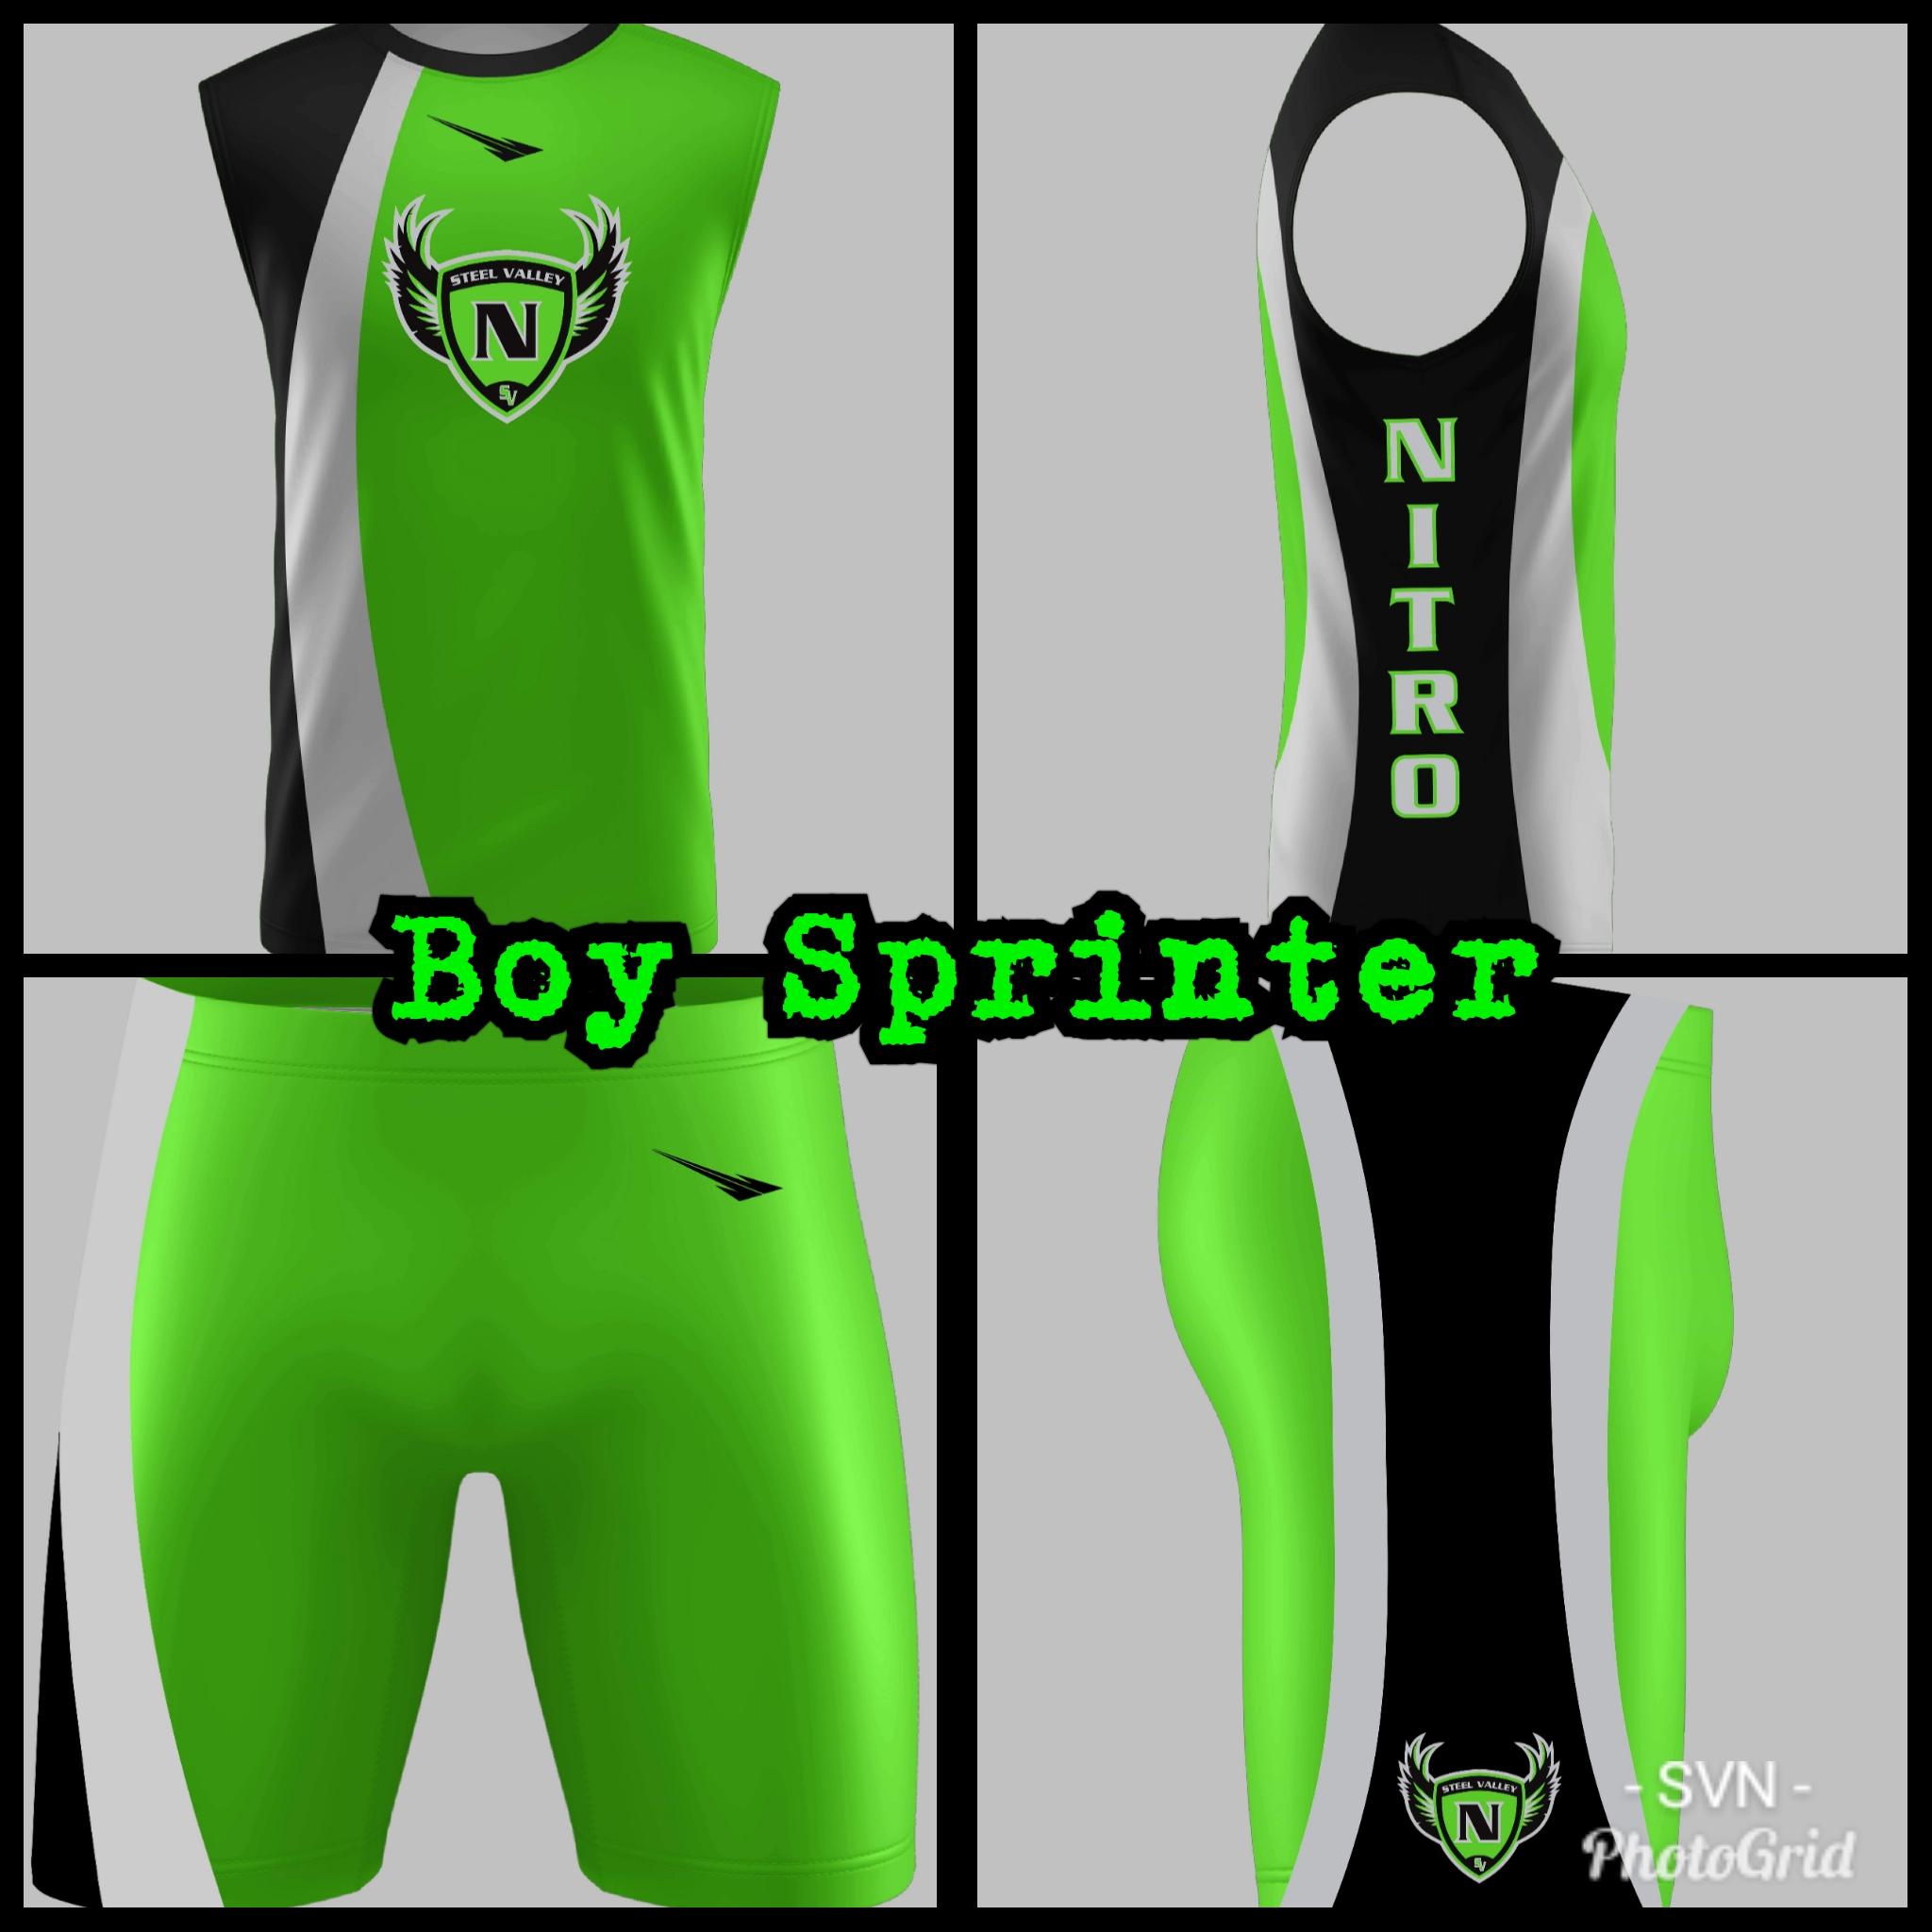 boy sprinter.jpg